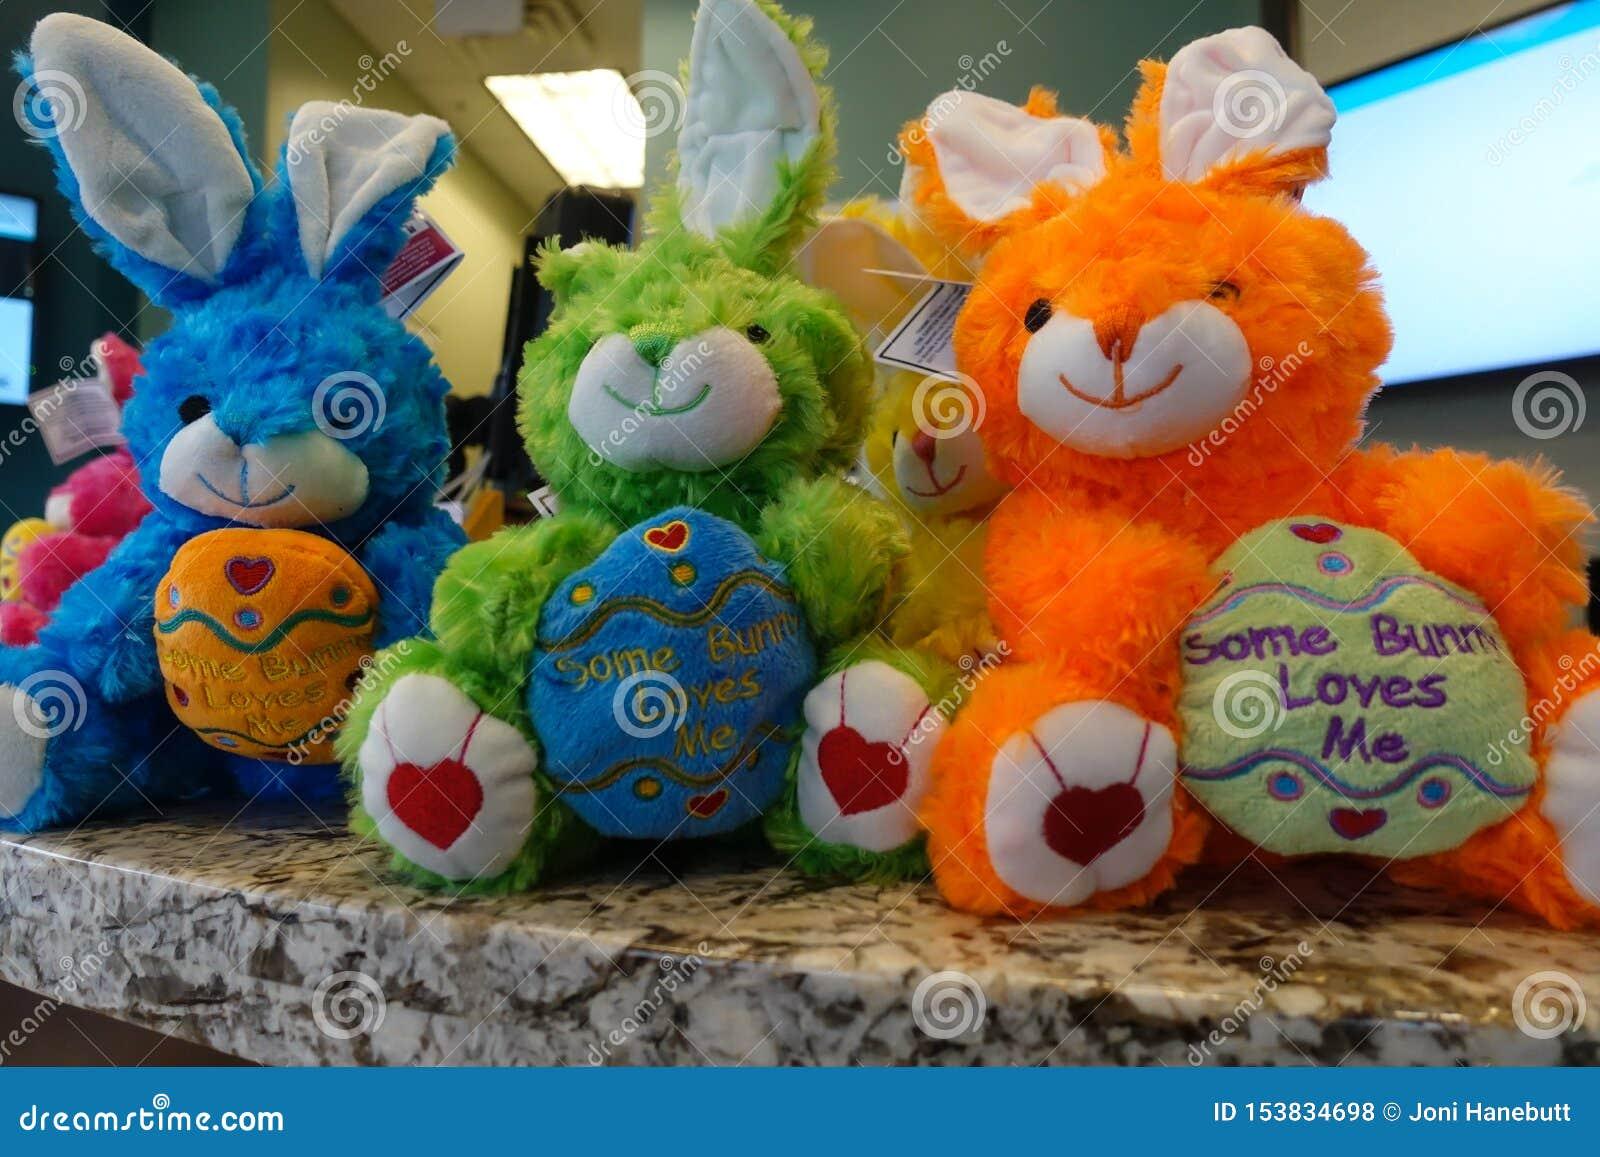 Colorful Stuffed bunny rabbits